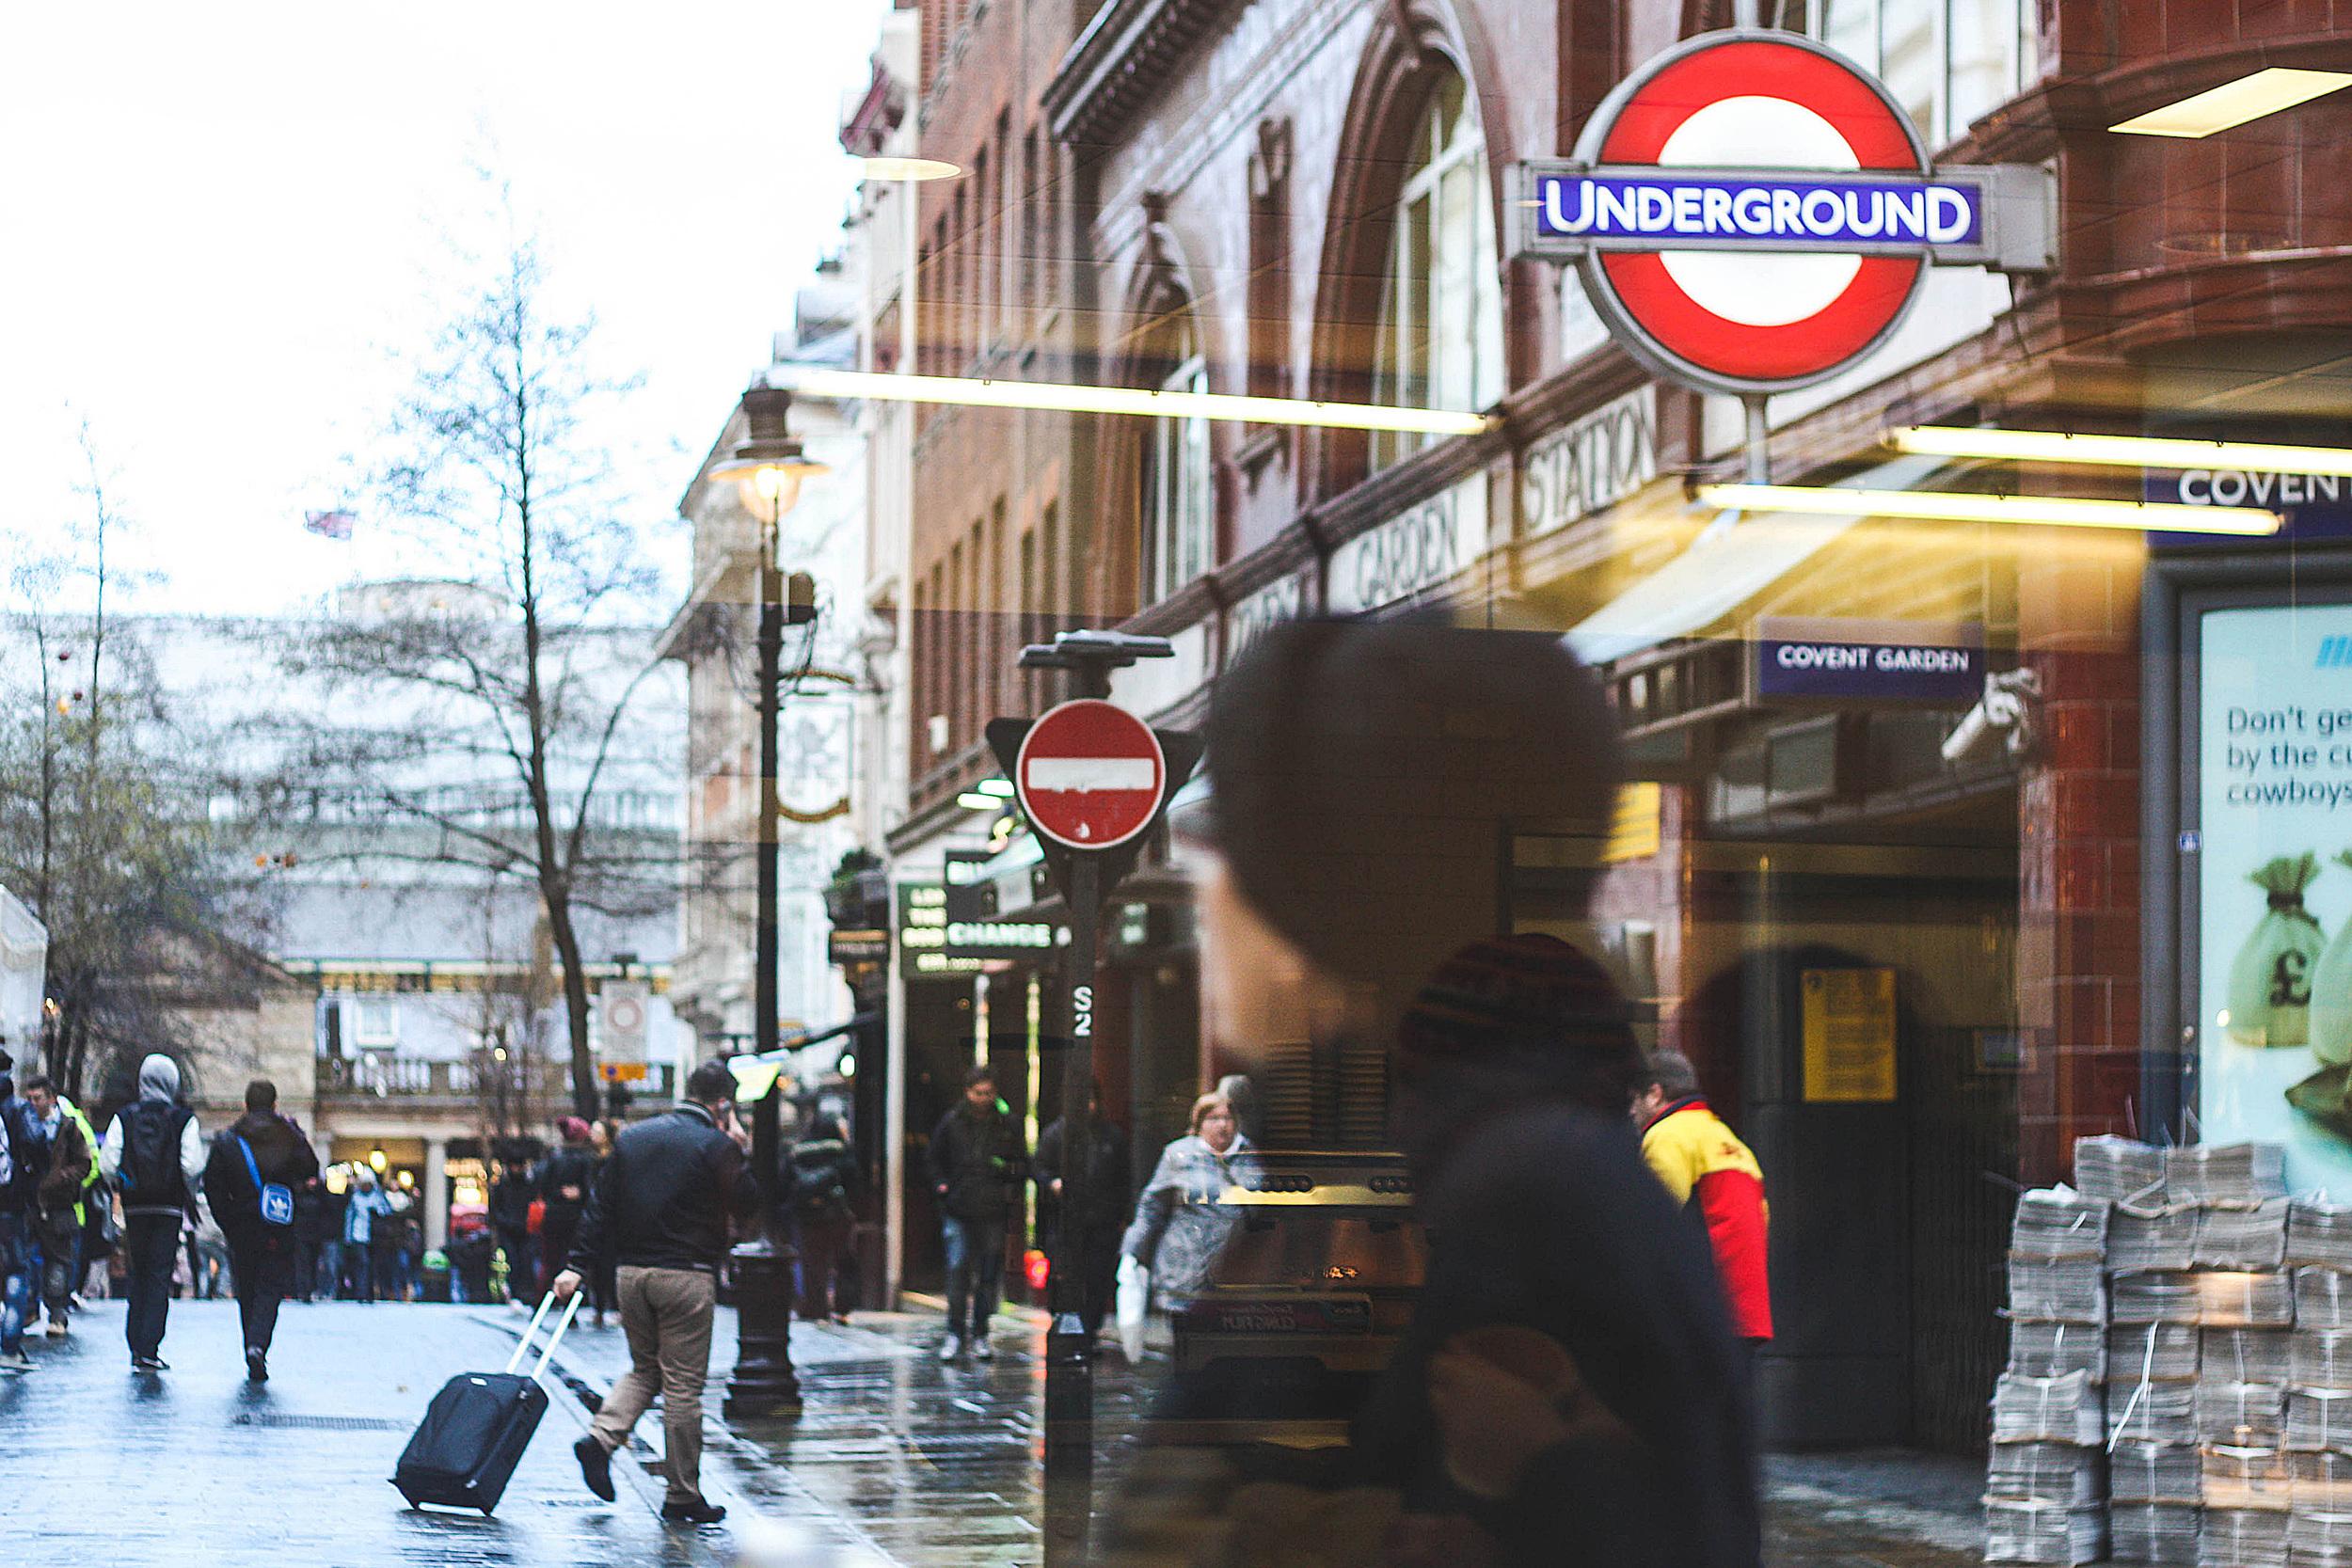 London - endearmentendure.com